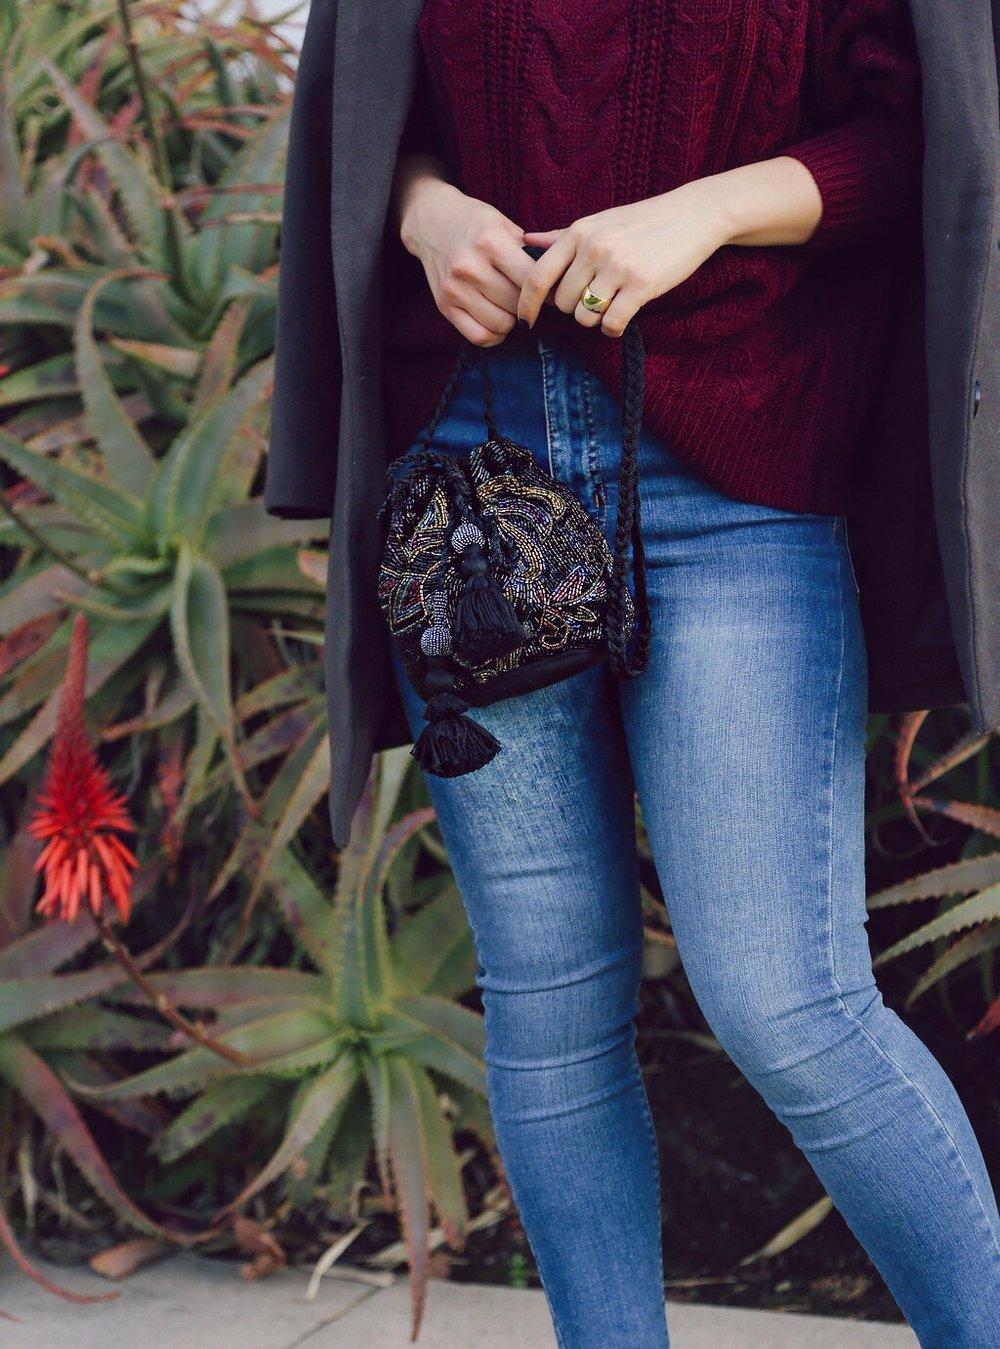 Beaded Bucket Bag, beaded bucket bag, beaded handbag, Beaded Handbag, Zara Handbags, zara handbags, Affordable Handbags, affordable handbags, Zara Clothing, zara clothing, Zara Women, zara women,